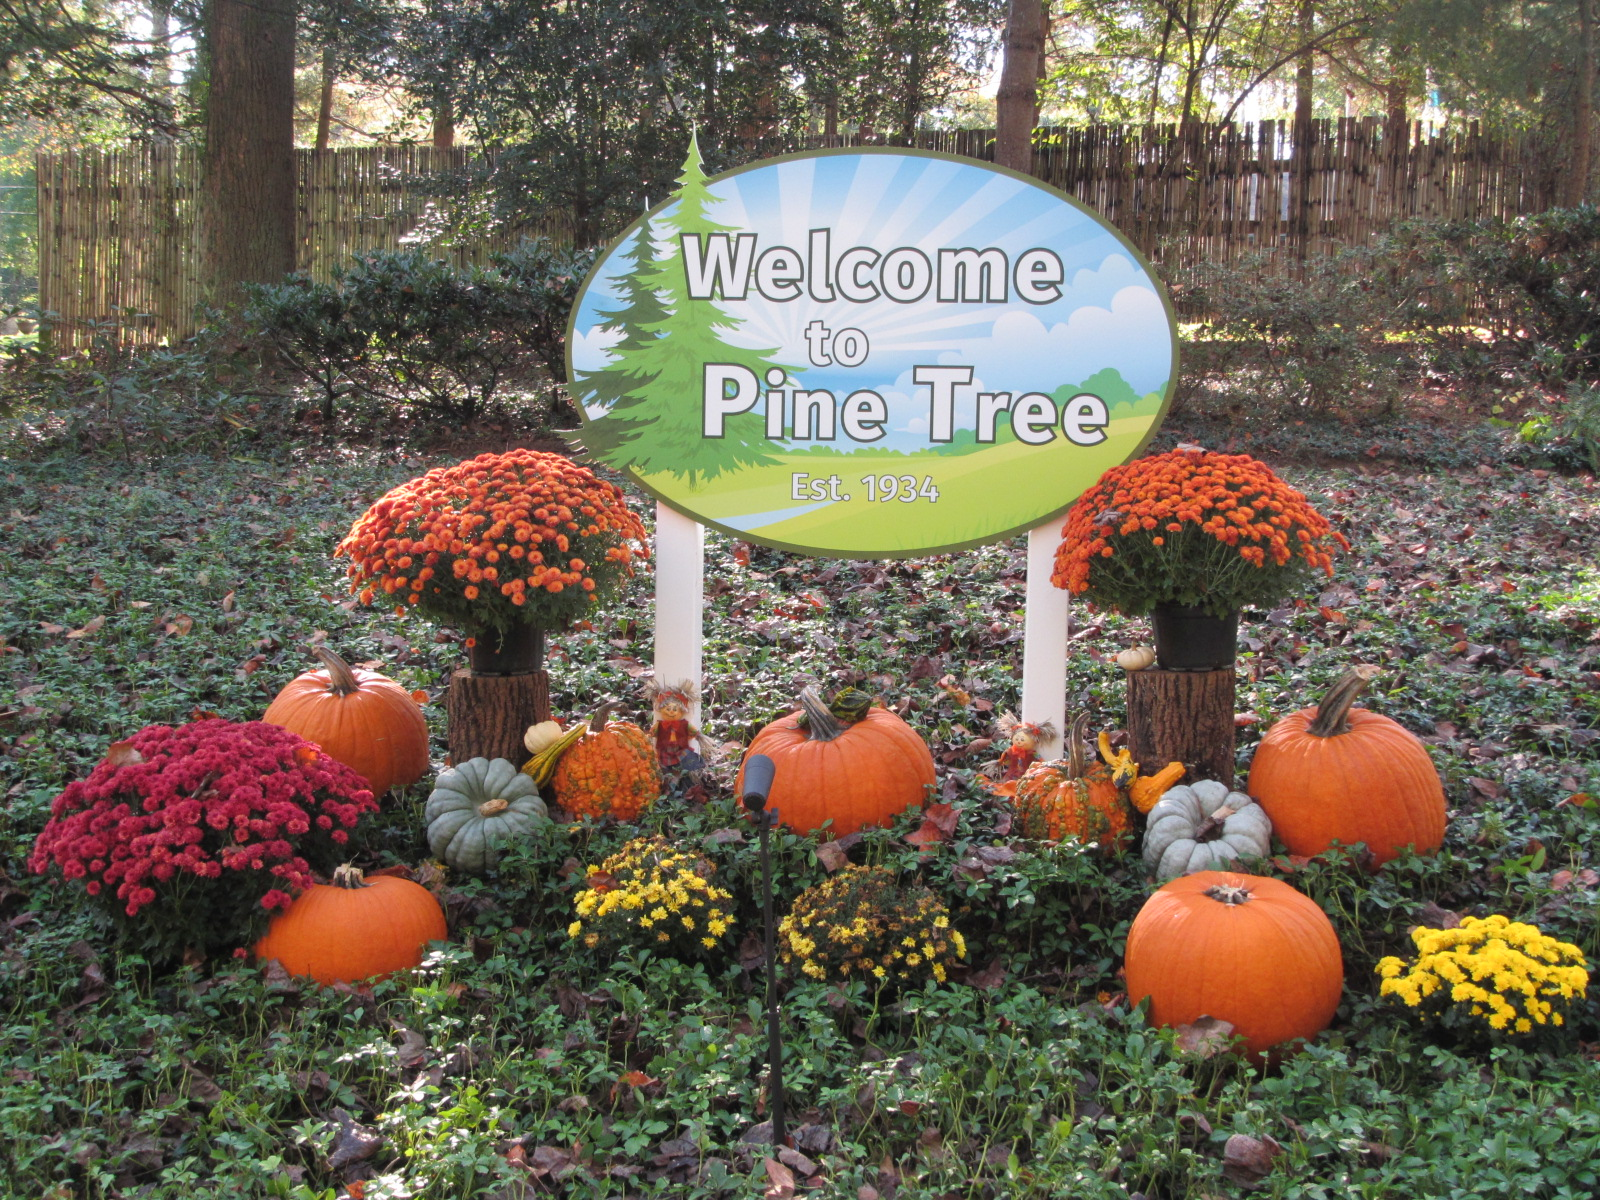 Welcome to Pine Tree - Fall 2017